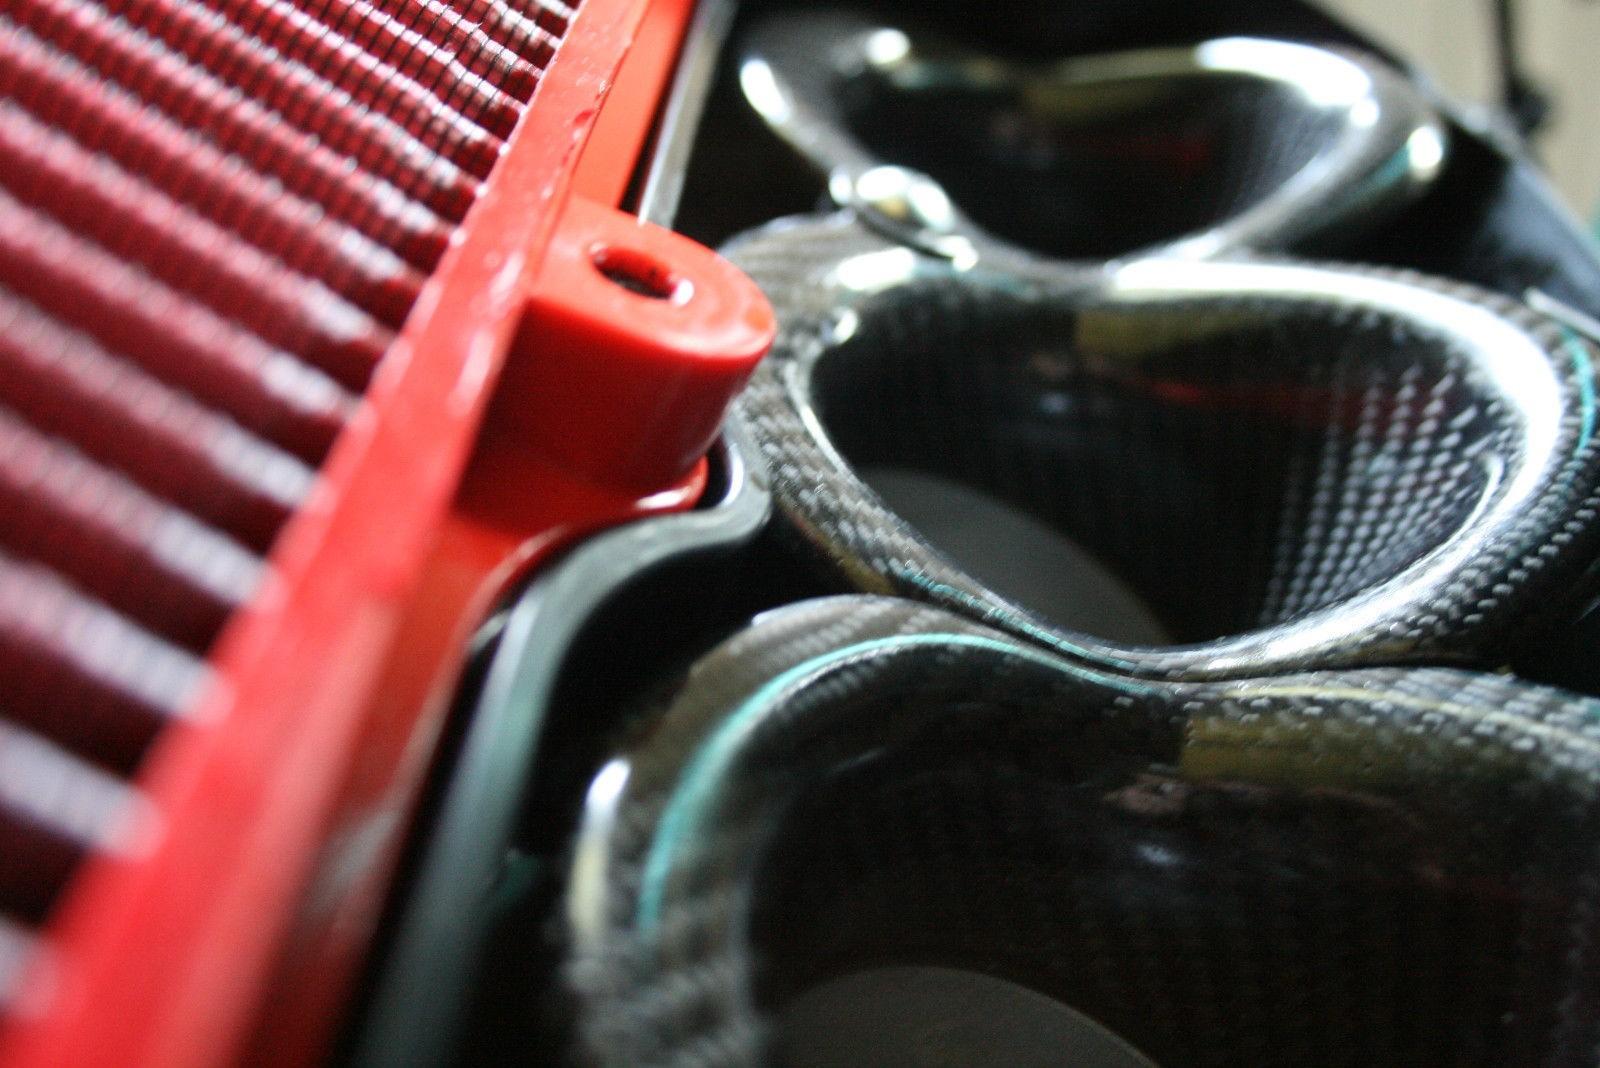 2016-20 Kawasaki ZX-10R / ZX-10RR Carbon Fiber Velocity Stack / Bellmouth Kit - MotoMaxx